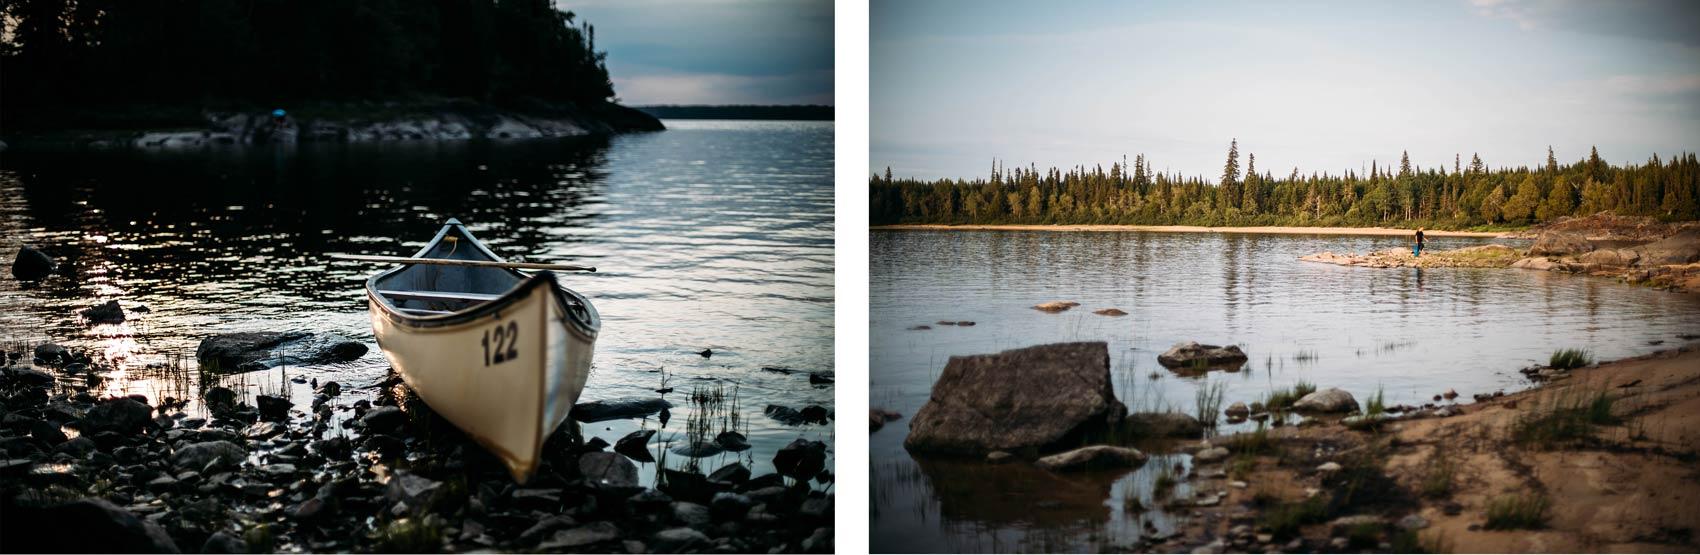 chalet en bois nord Québec